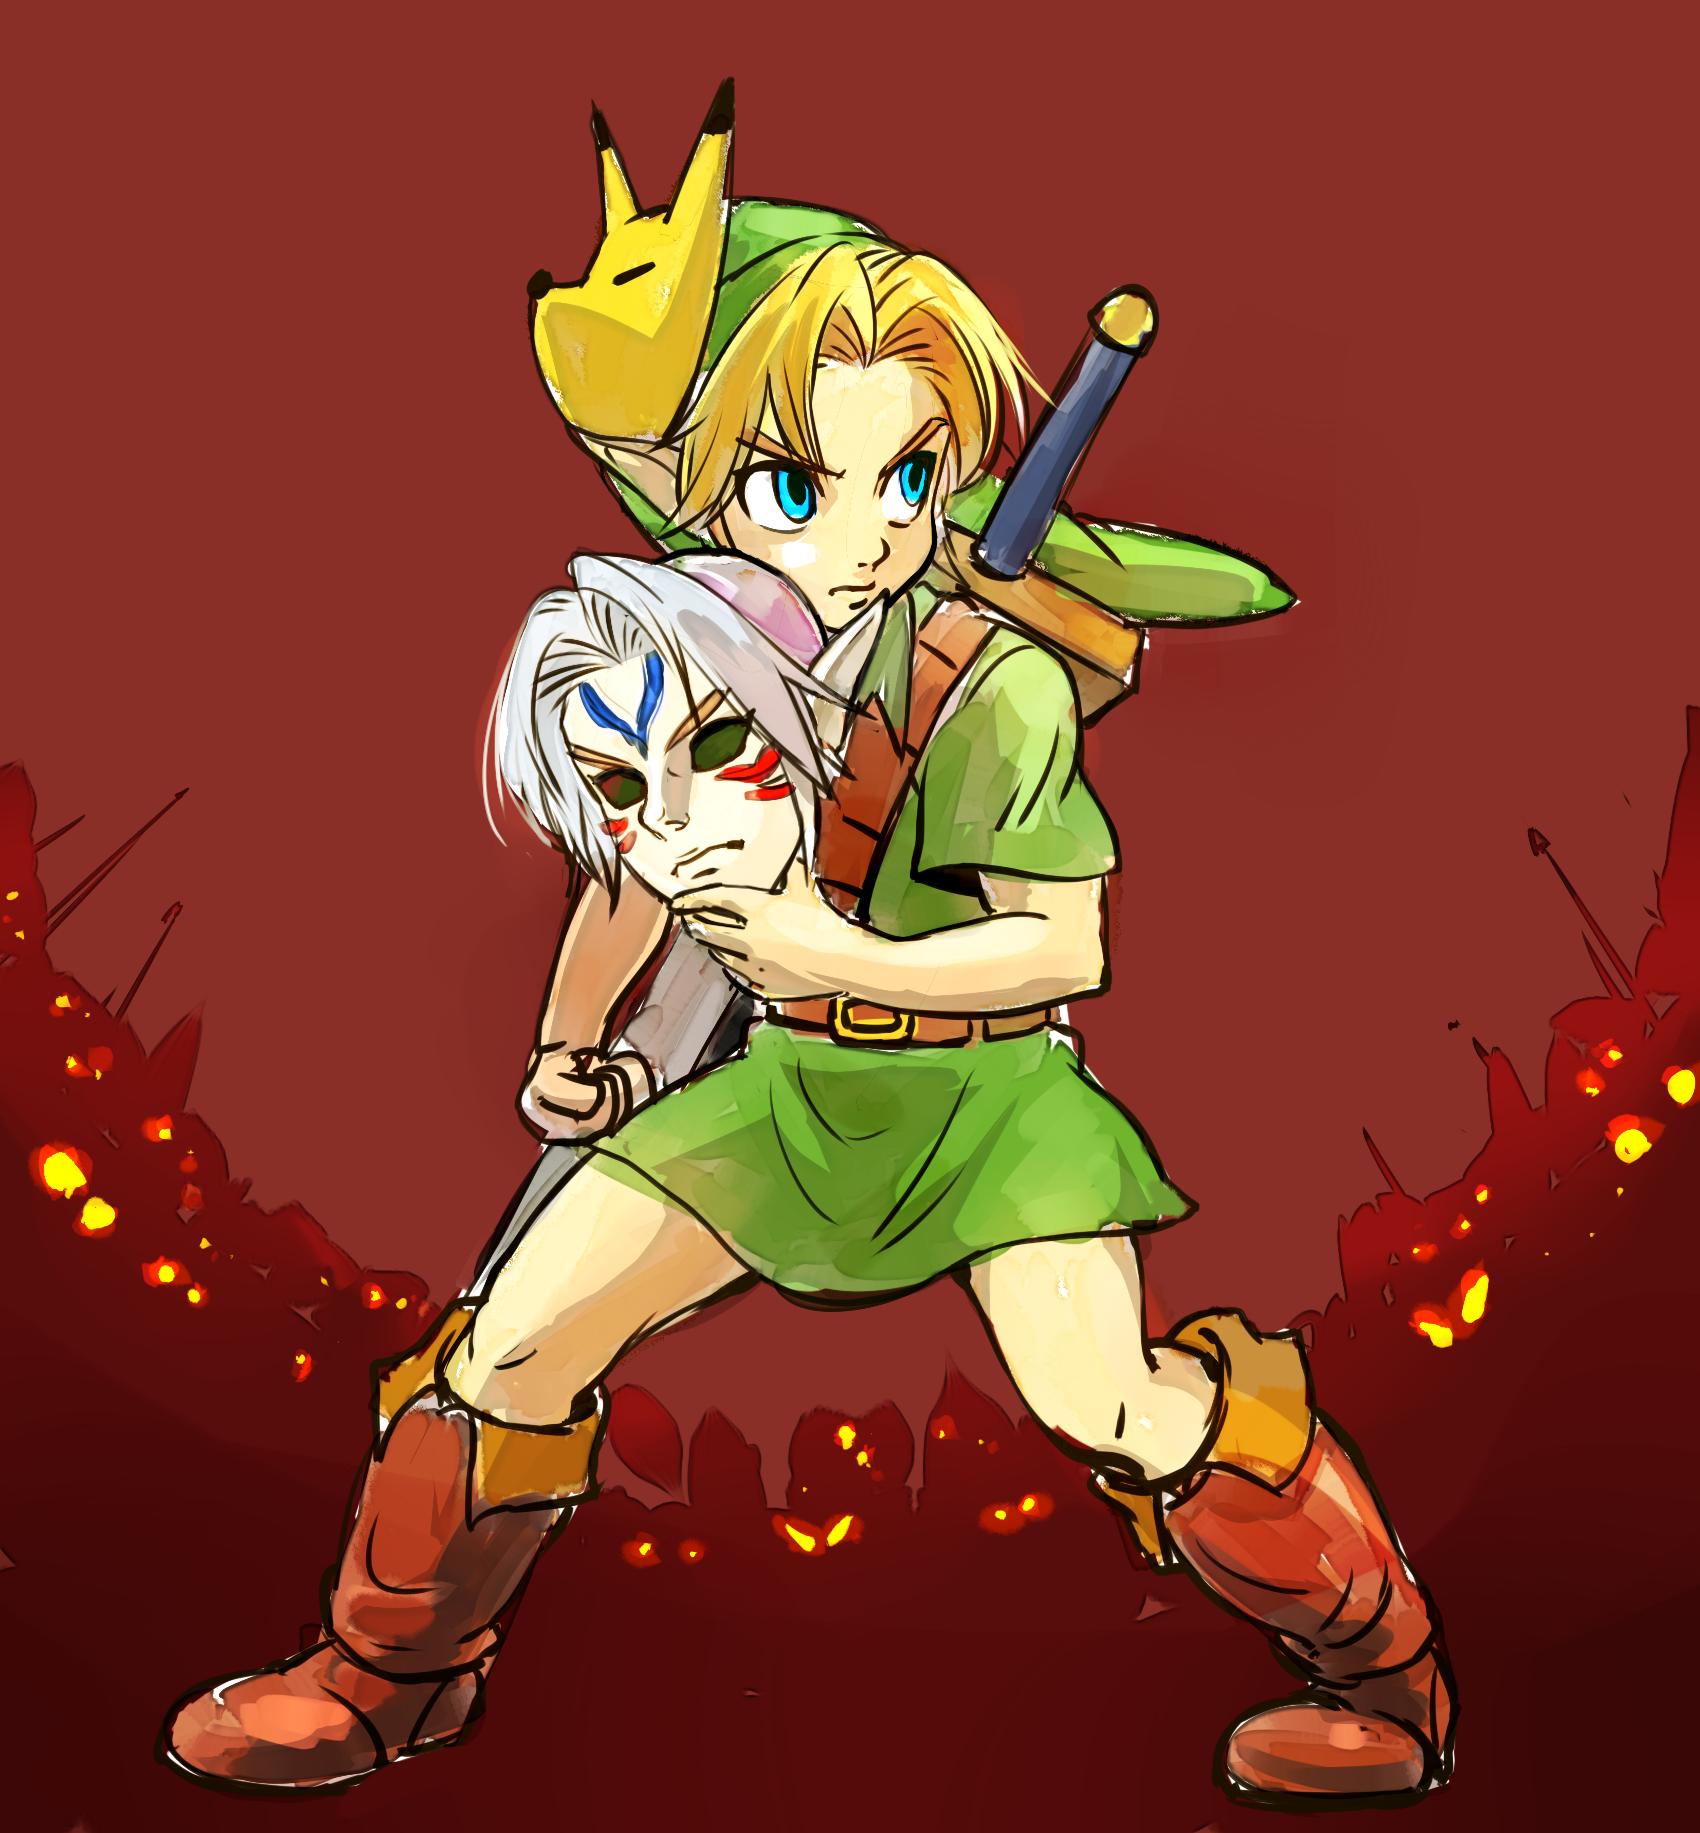 "The Legend Of Zelda Majora S Mask Young Link ¼ルダの伝説まとめ Æ¢Ÿ Á®æ¼«ç""» Pixiv 20 ļèª¬ ¼ルダの伝説 ¼ルダ"